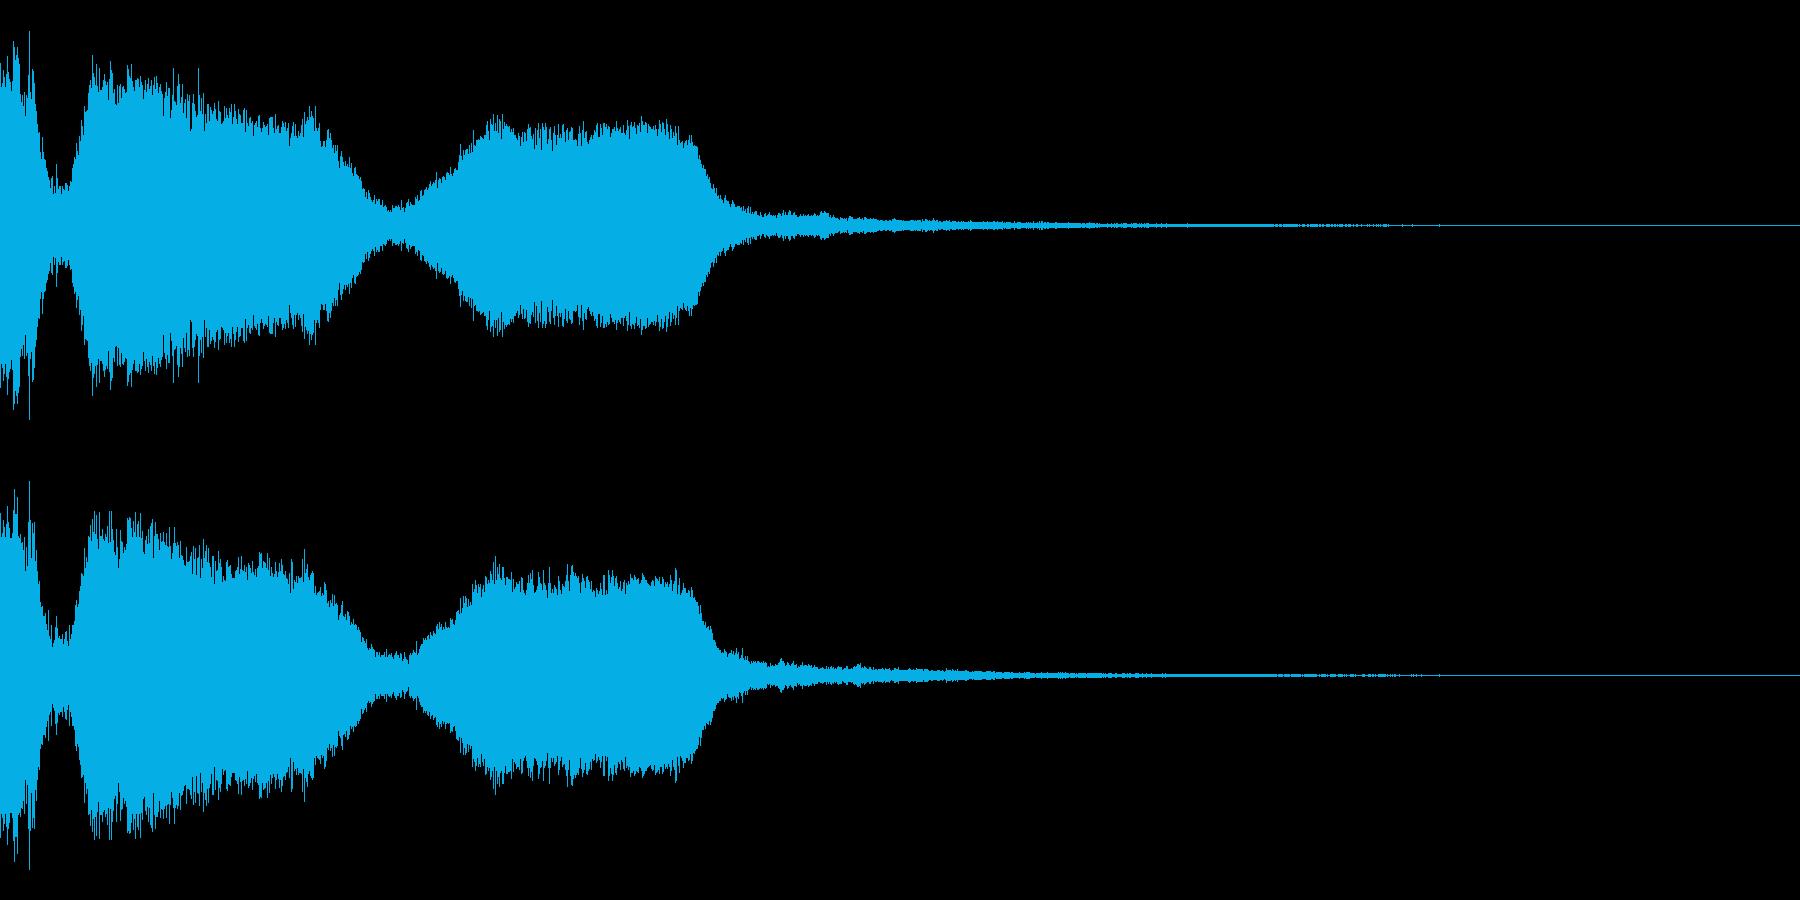 DJFX ヒットチャート発表前SE 6の再生済みの波形